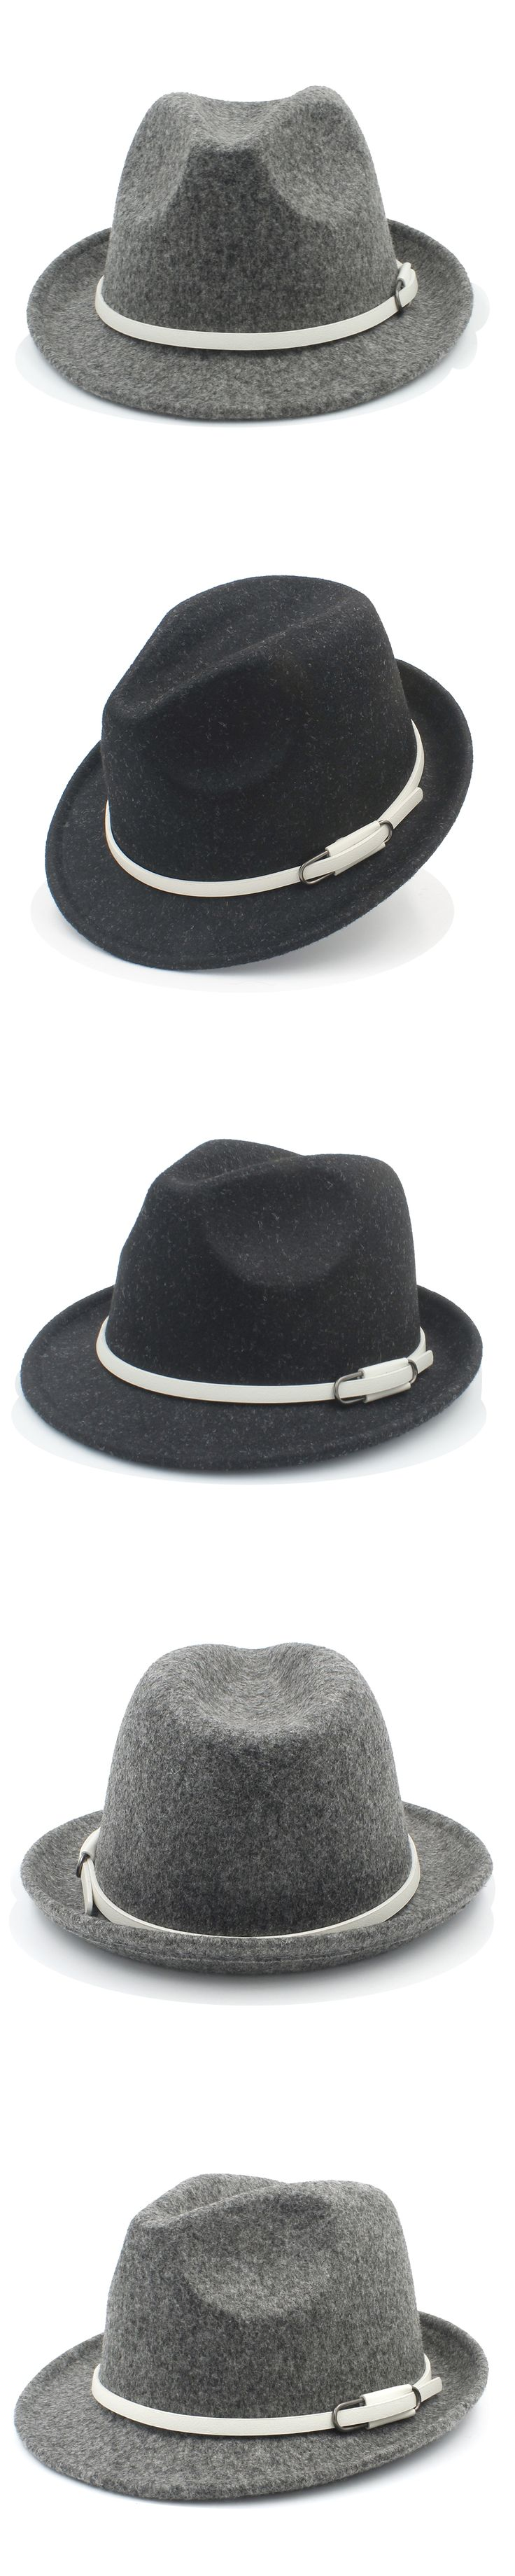 Fashion Women Men Wool Fedora Hat Winter Autumn Elegant Lady Trilby Homburg Church Derby Jazz Caps Size 56-58CM